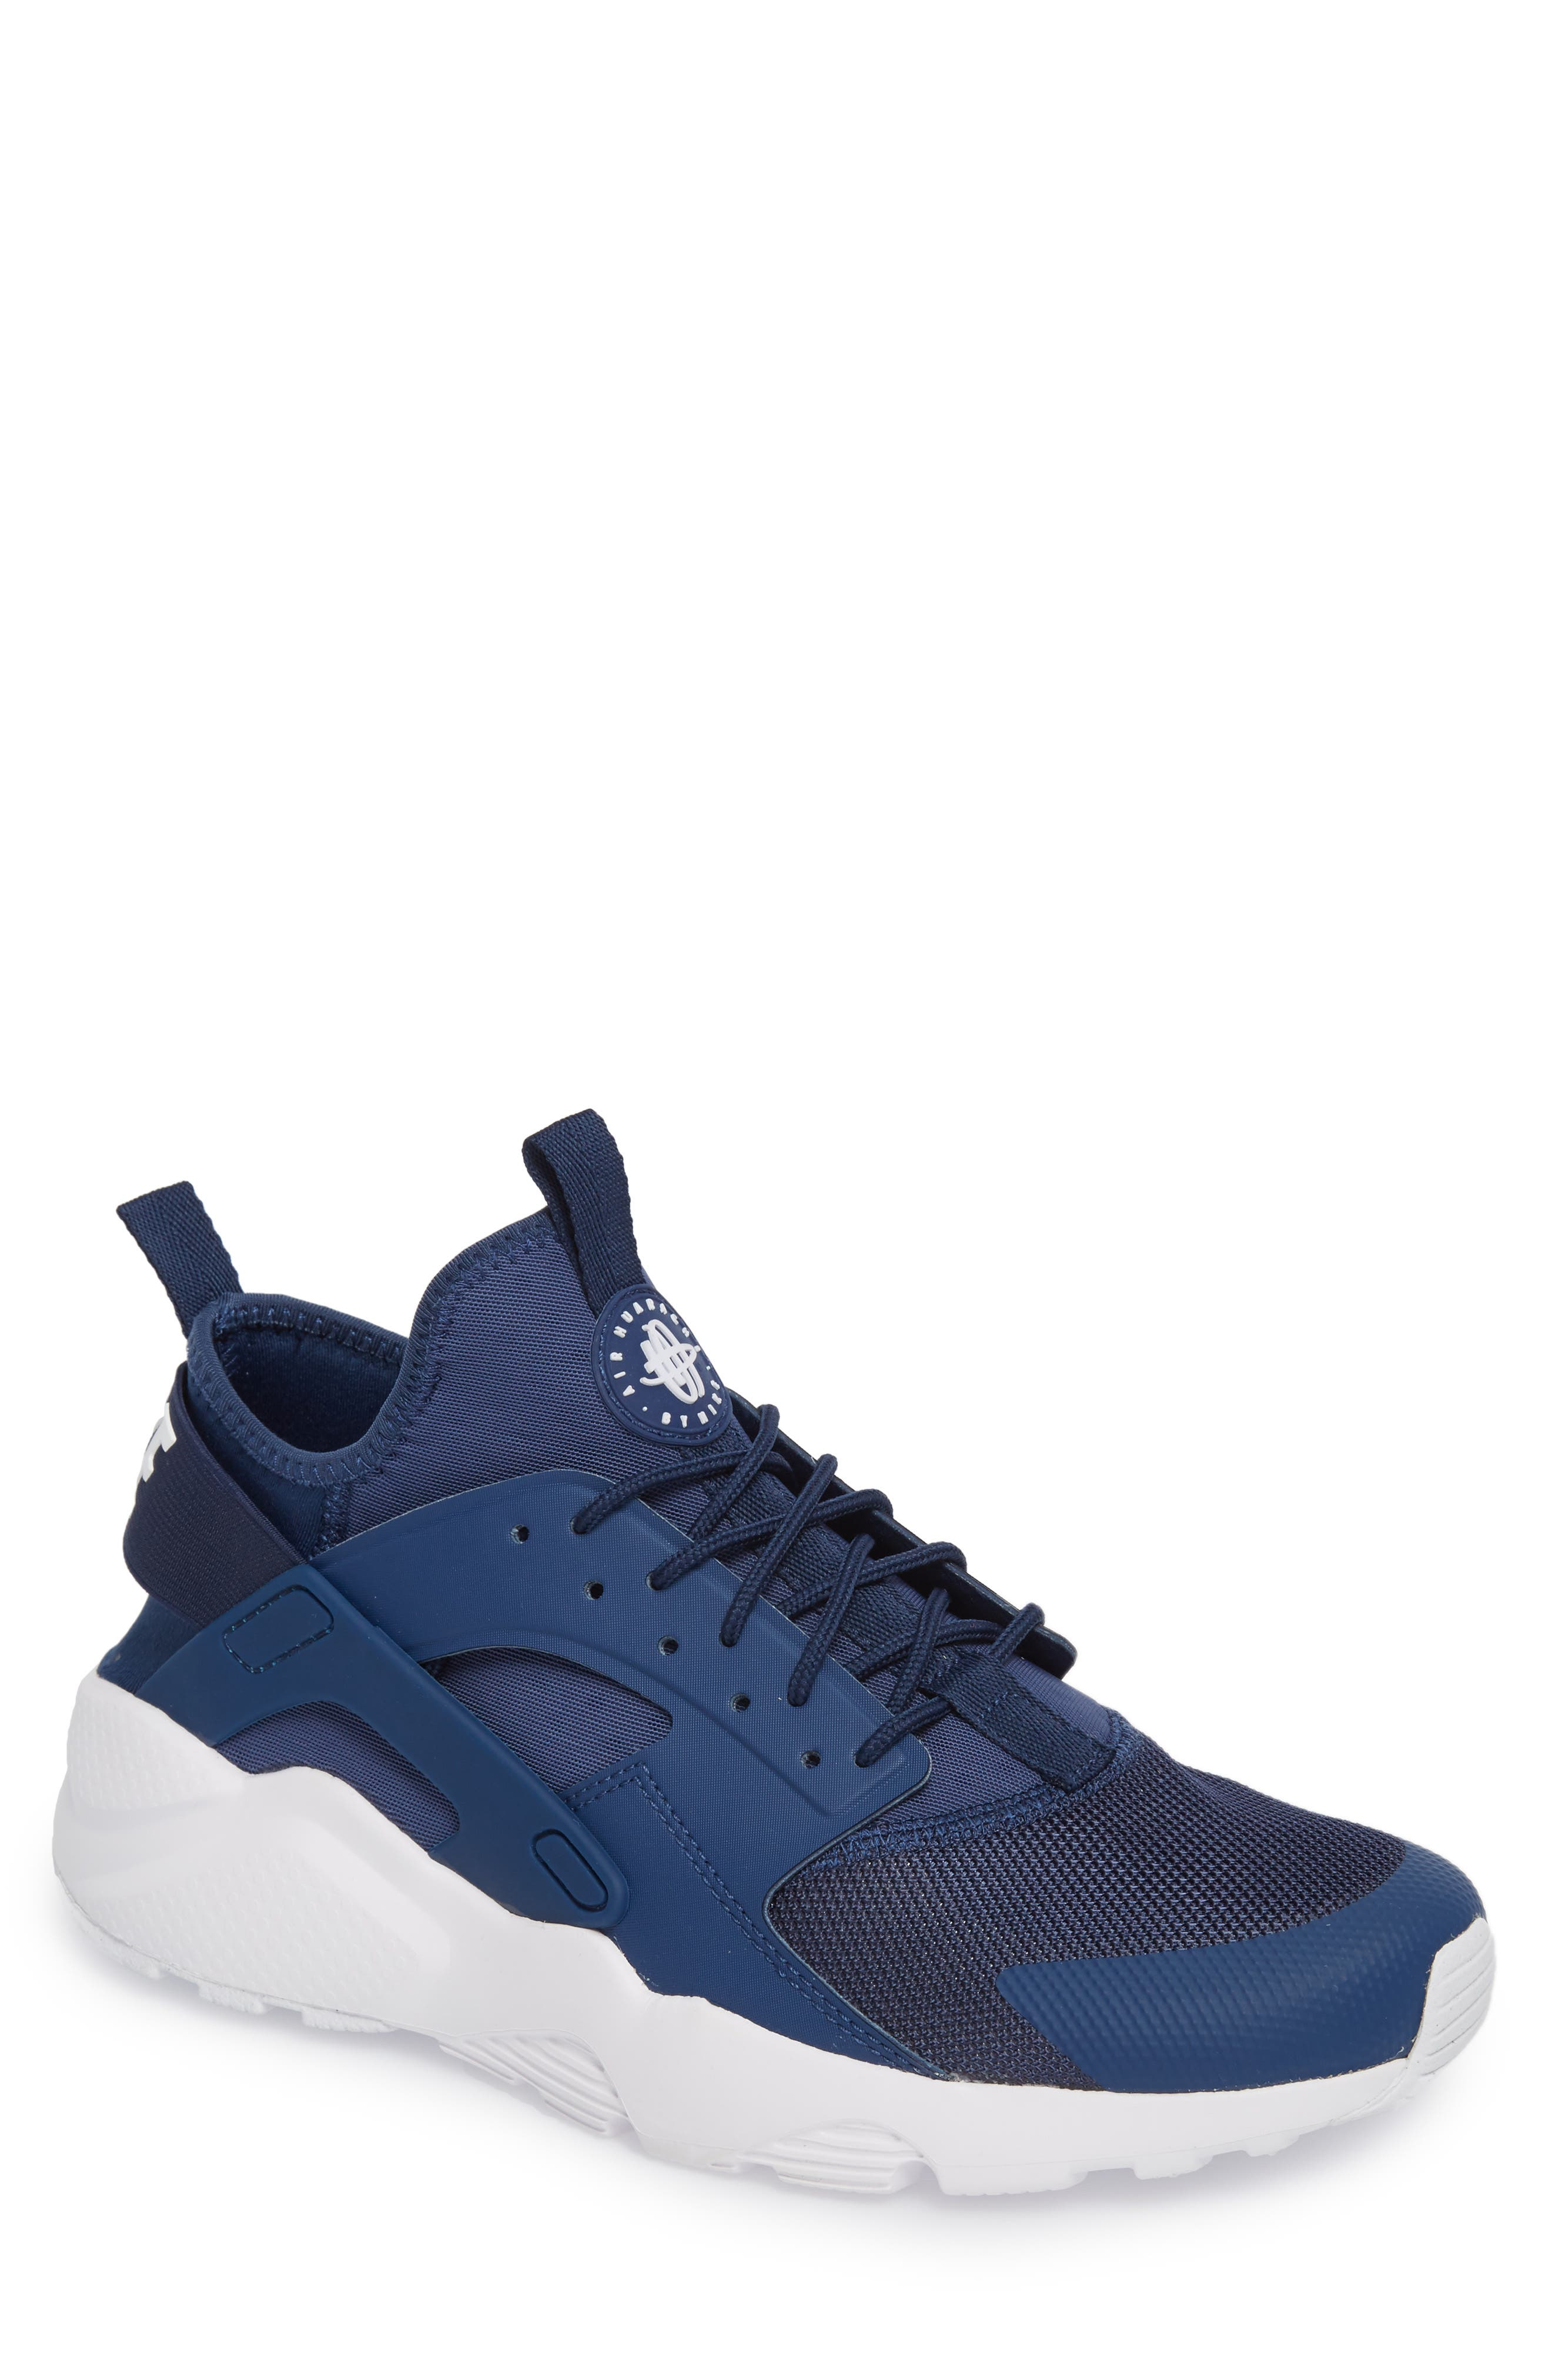 Nike Air Huarache Run Ultra Sneaker (Men) (Regular Retail Price: $120.00)